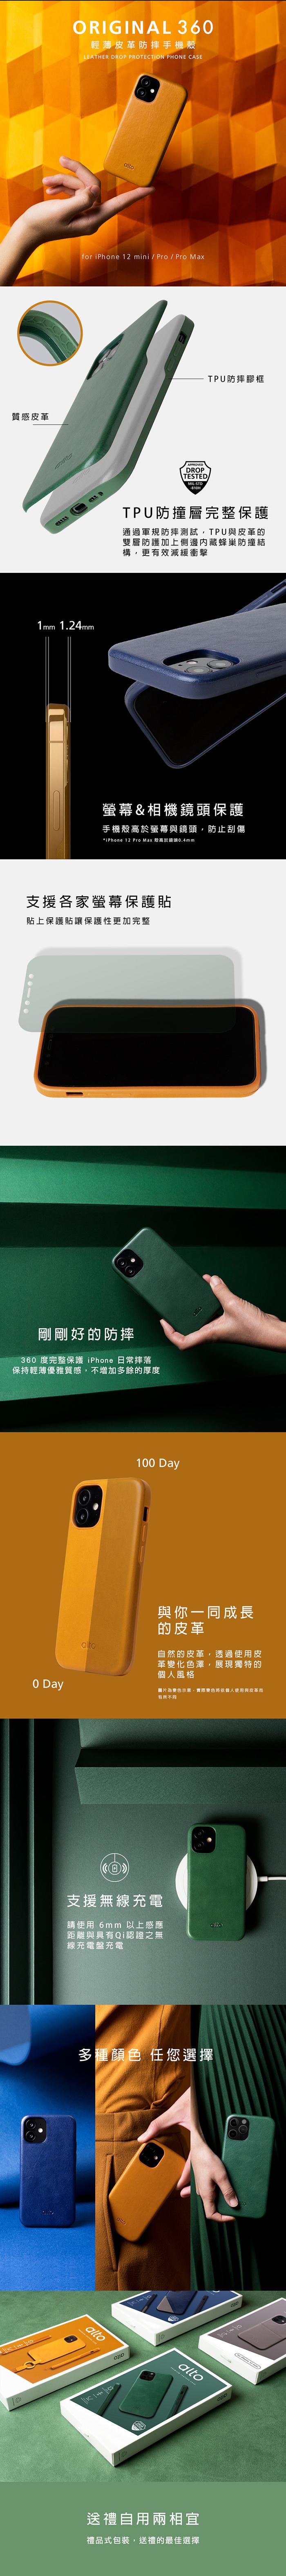 Alto|iPhone 12 mini  5.4吋 真皮手機殼背蓋 Original 360 - (海軍藍)